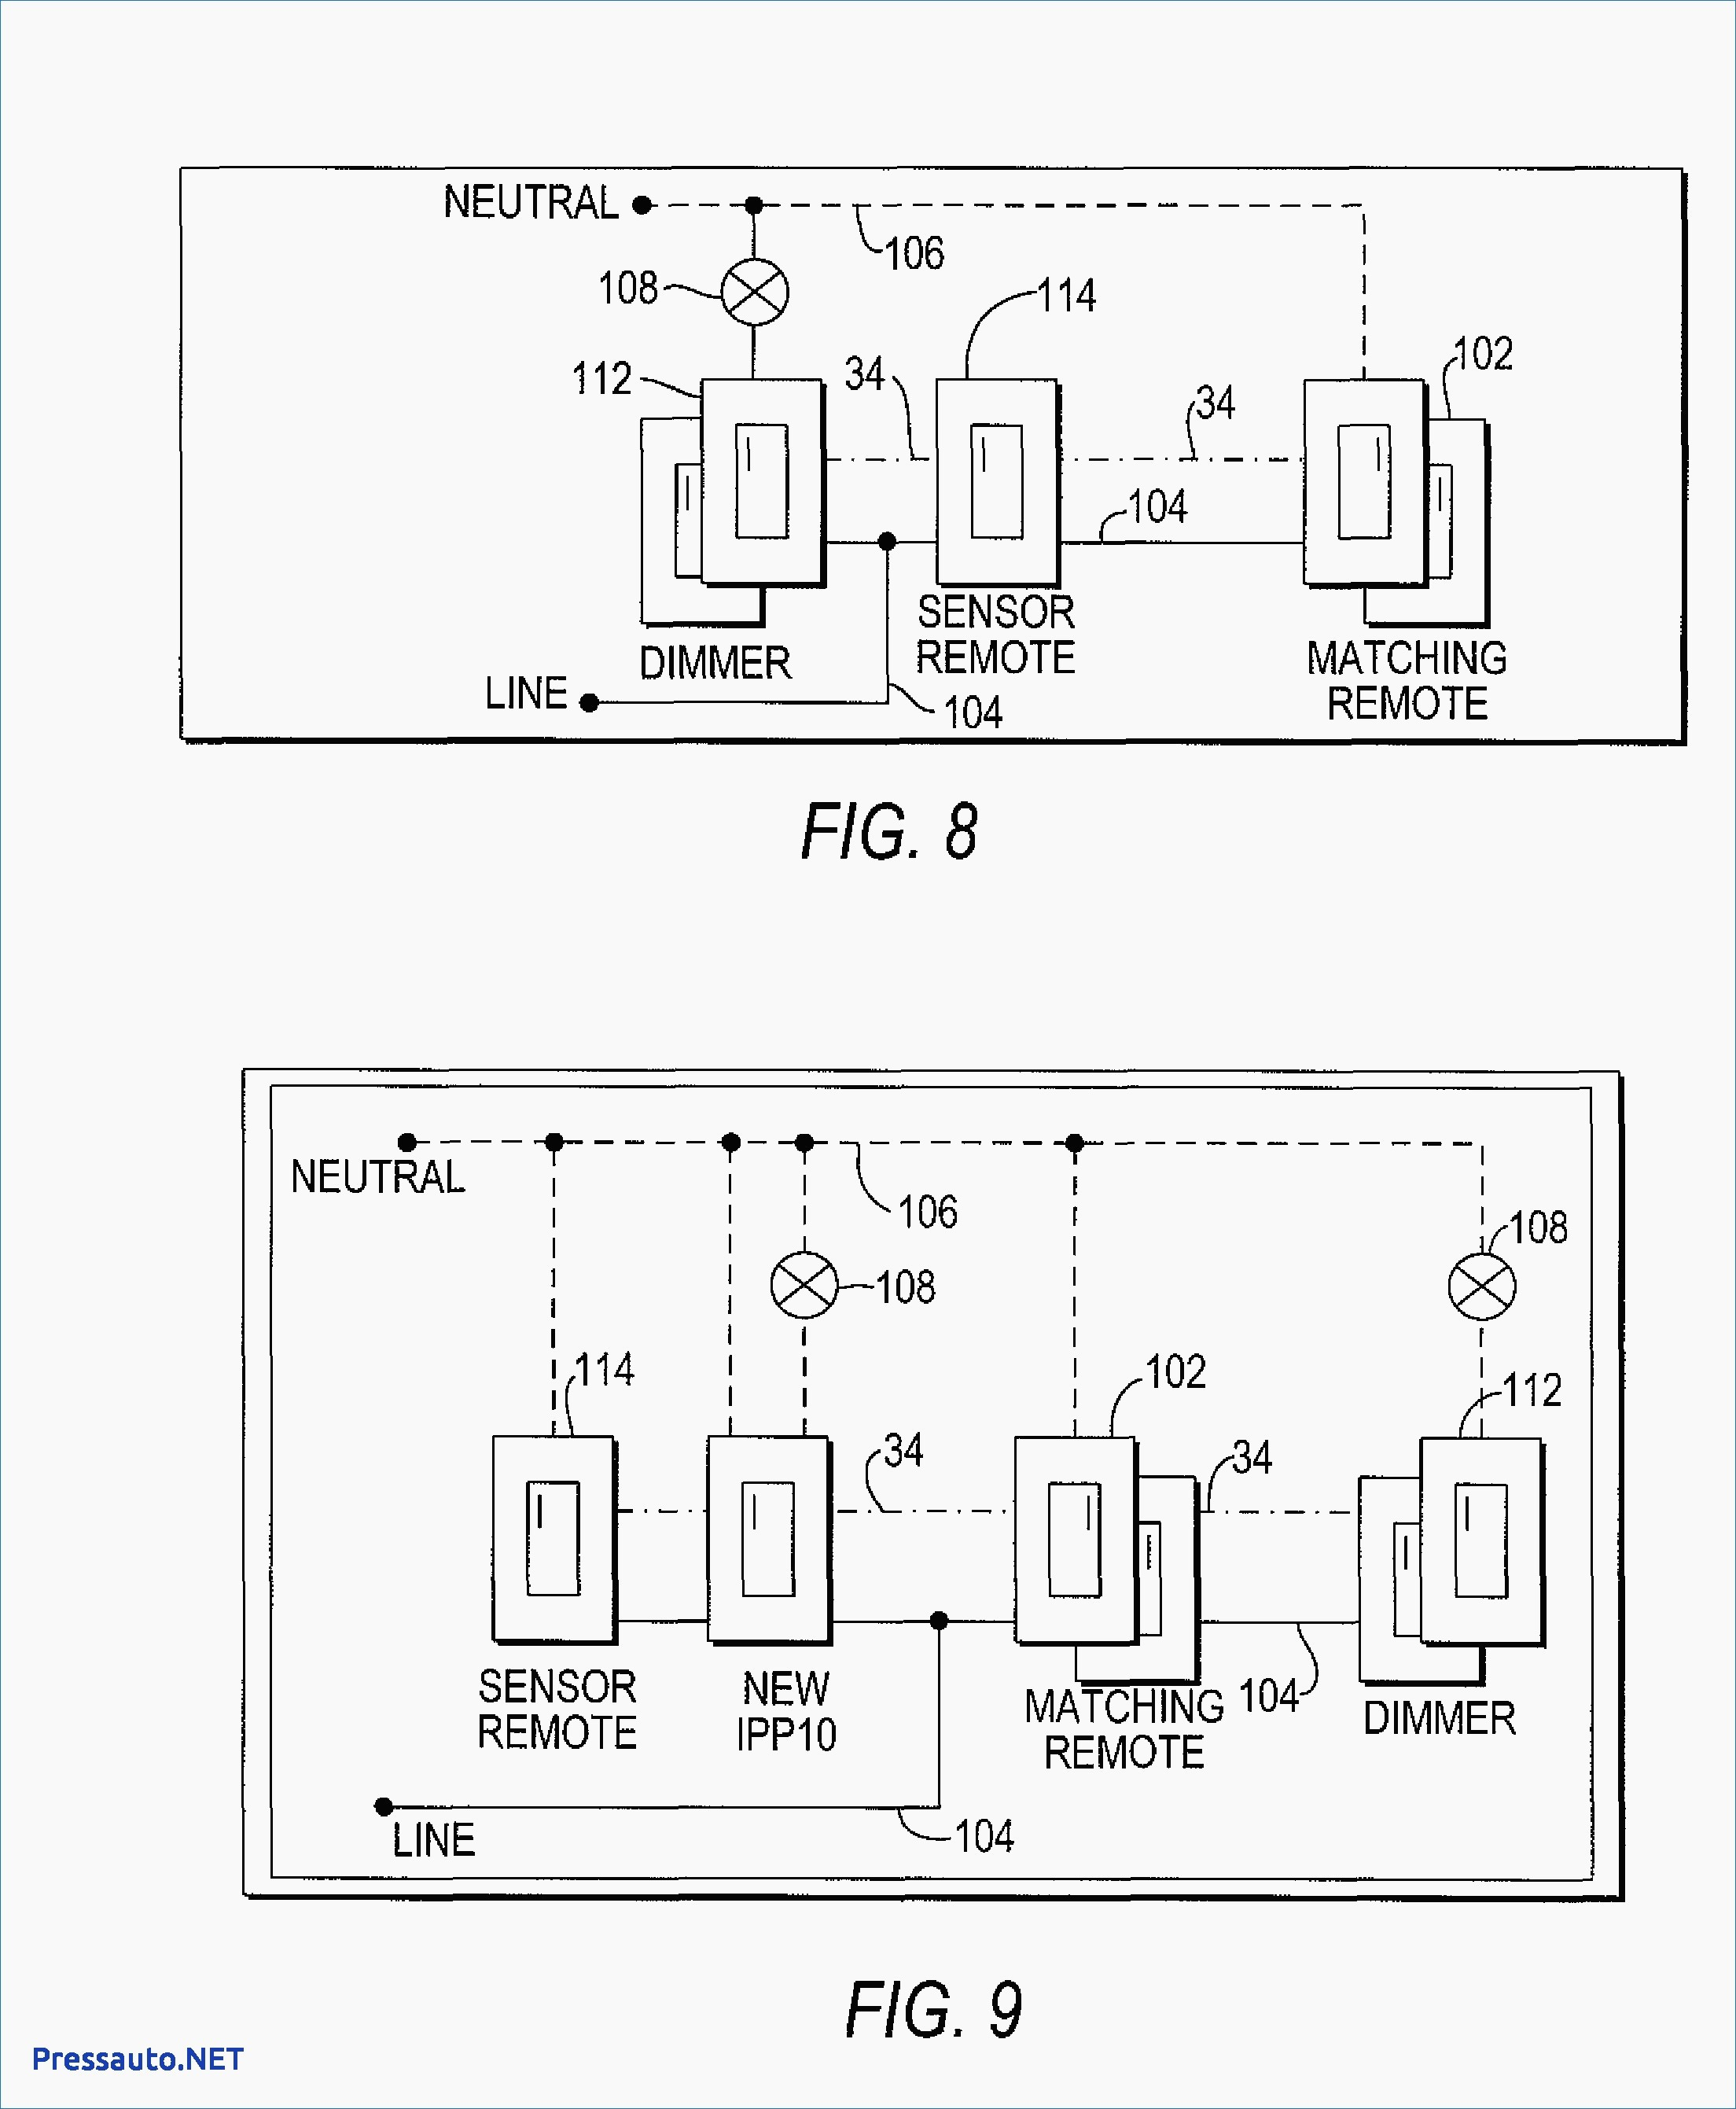 Lutron Diva Cl Wiring Diagram Inspirational Part 22 Wiring Diagram Electrical Wiring Circuit Diagram Schematic